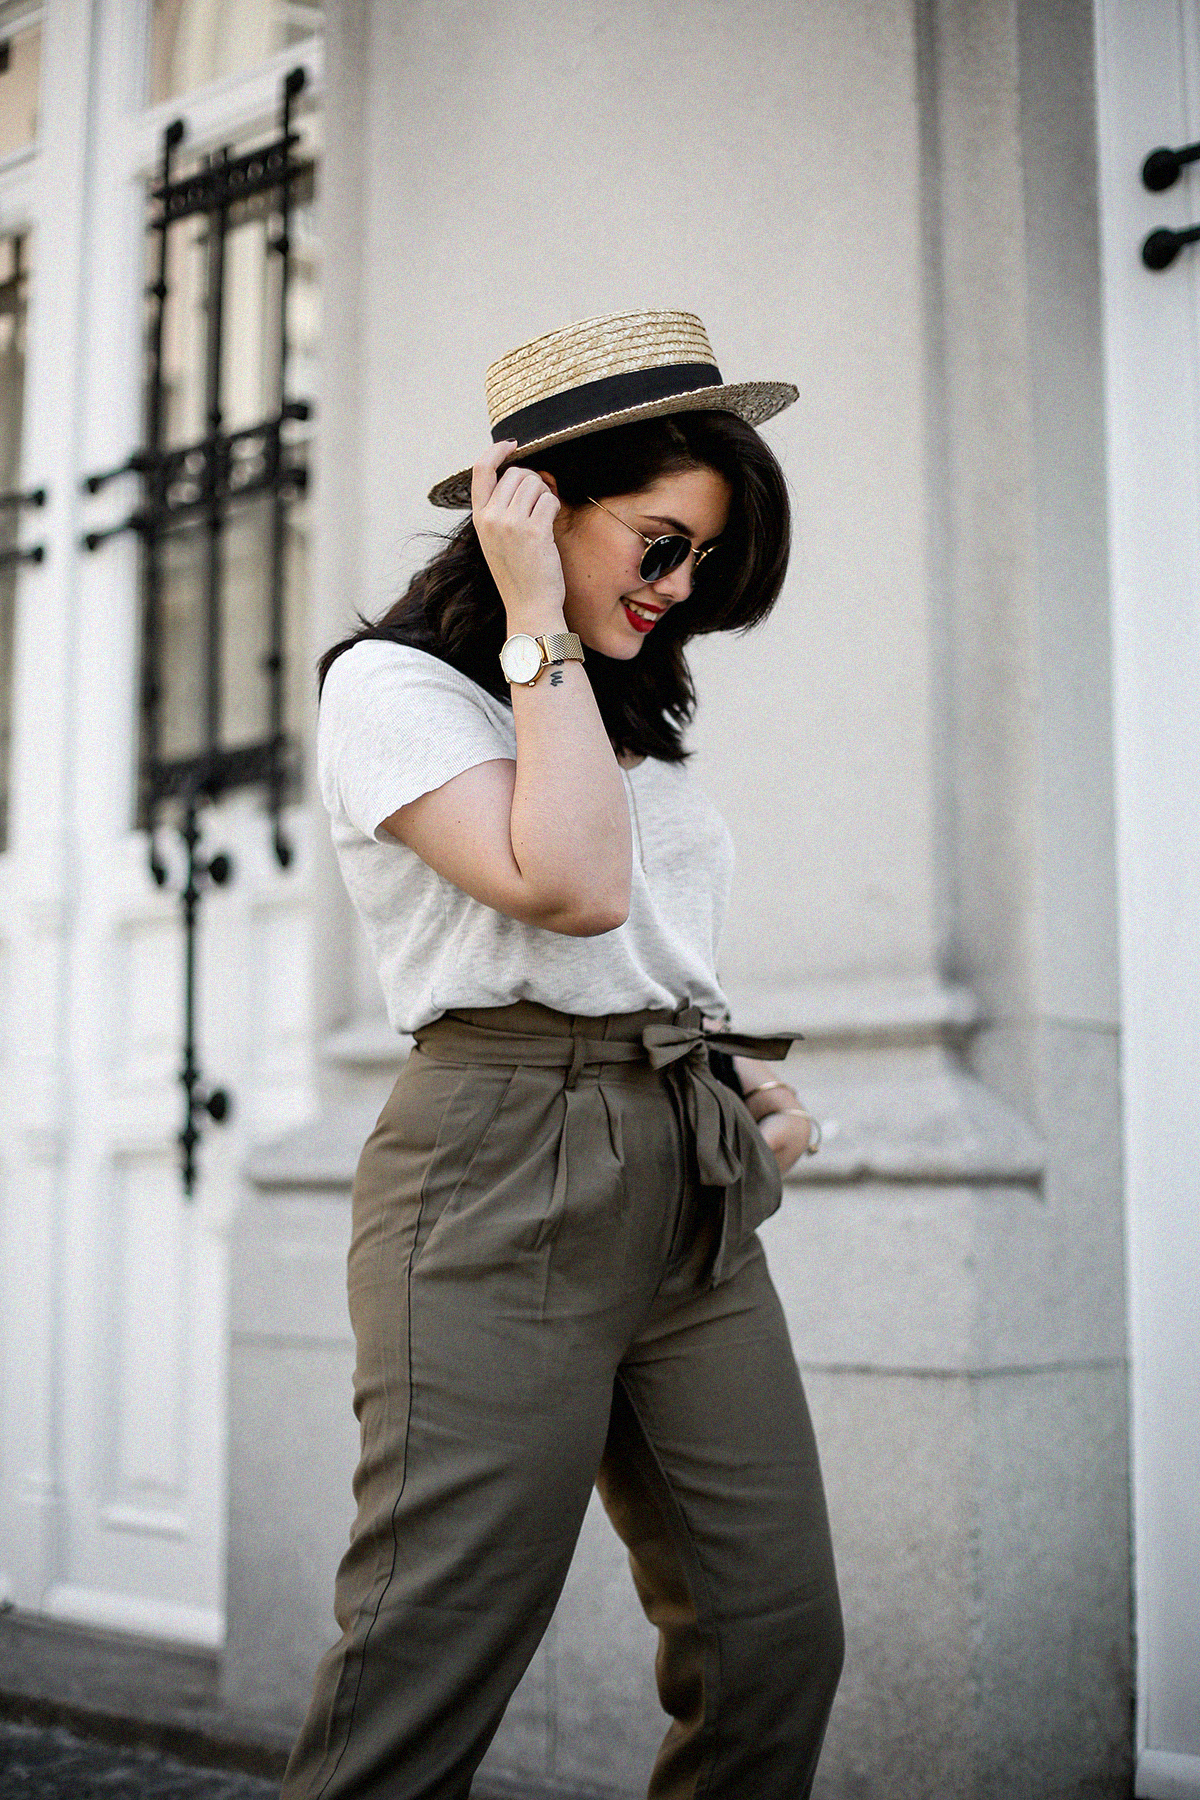 pantalones-verdes-altos-palas-borlas-zara-canotier-look-myblueberrynightsblog14